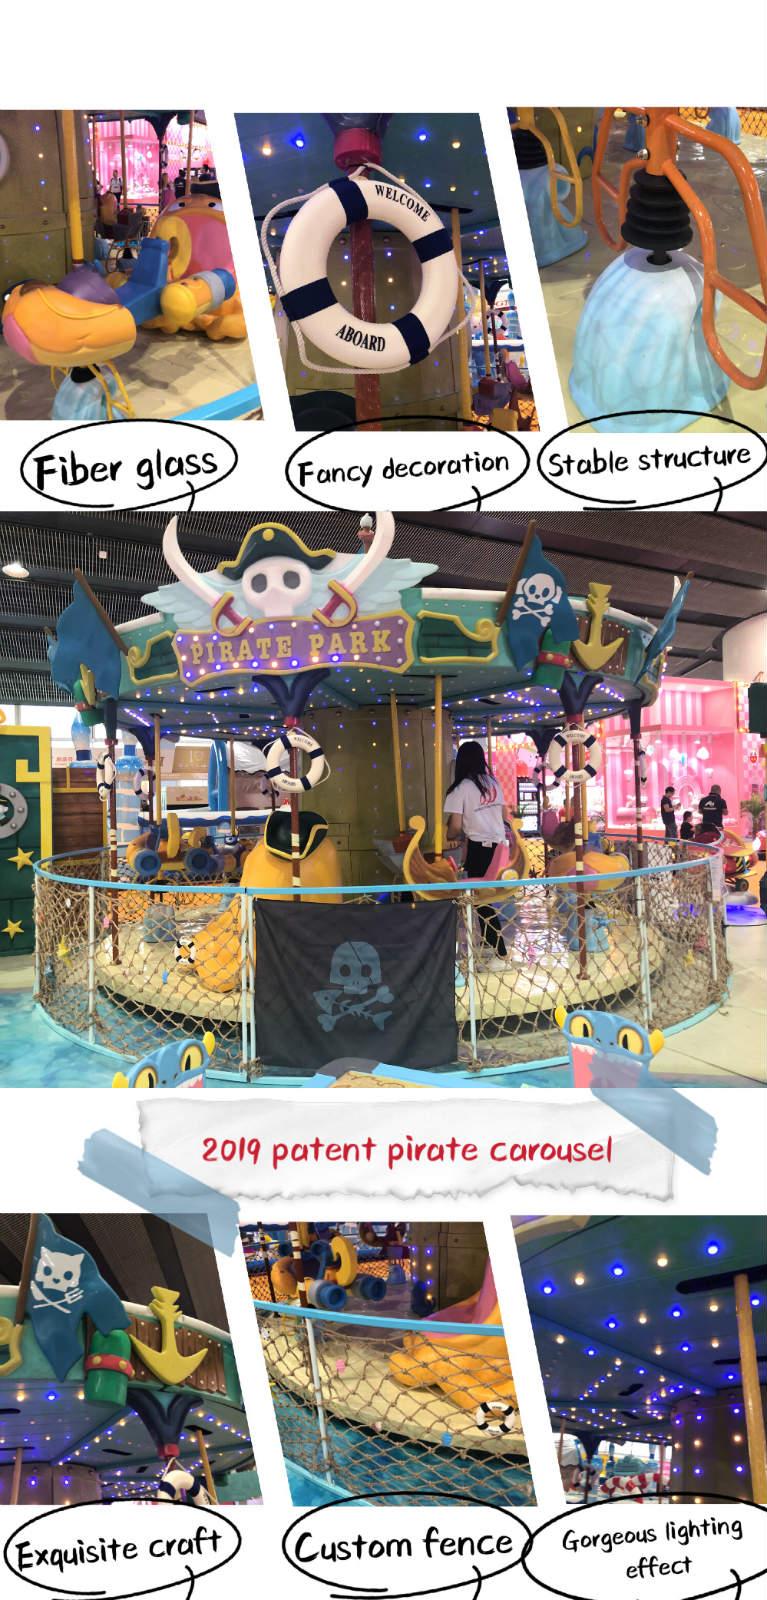 World Fun Attractions-High Quality Caribbeanisland-pirate Eddy Carousel | Carousel-5